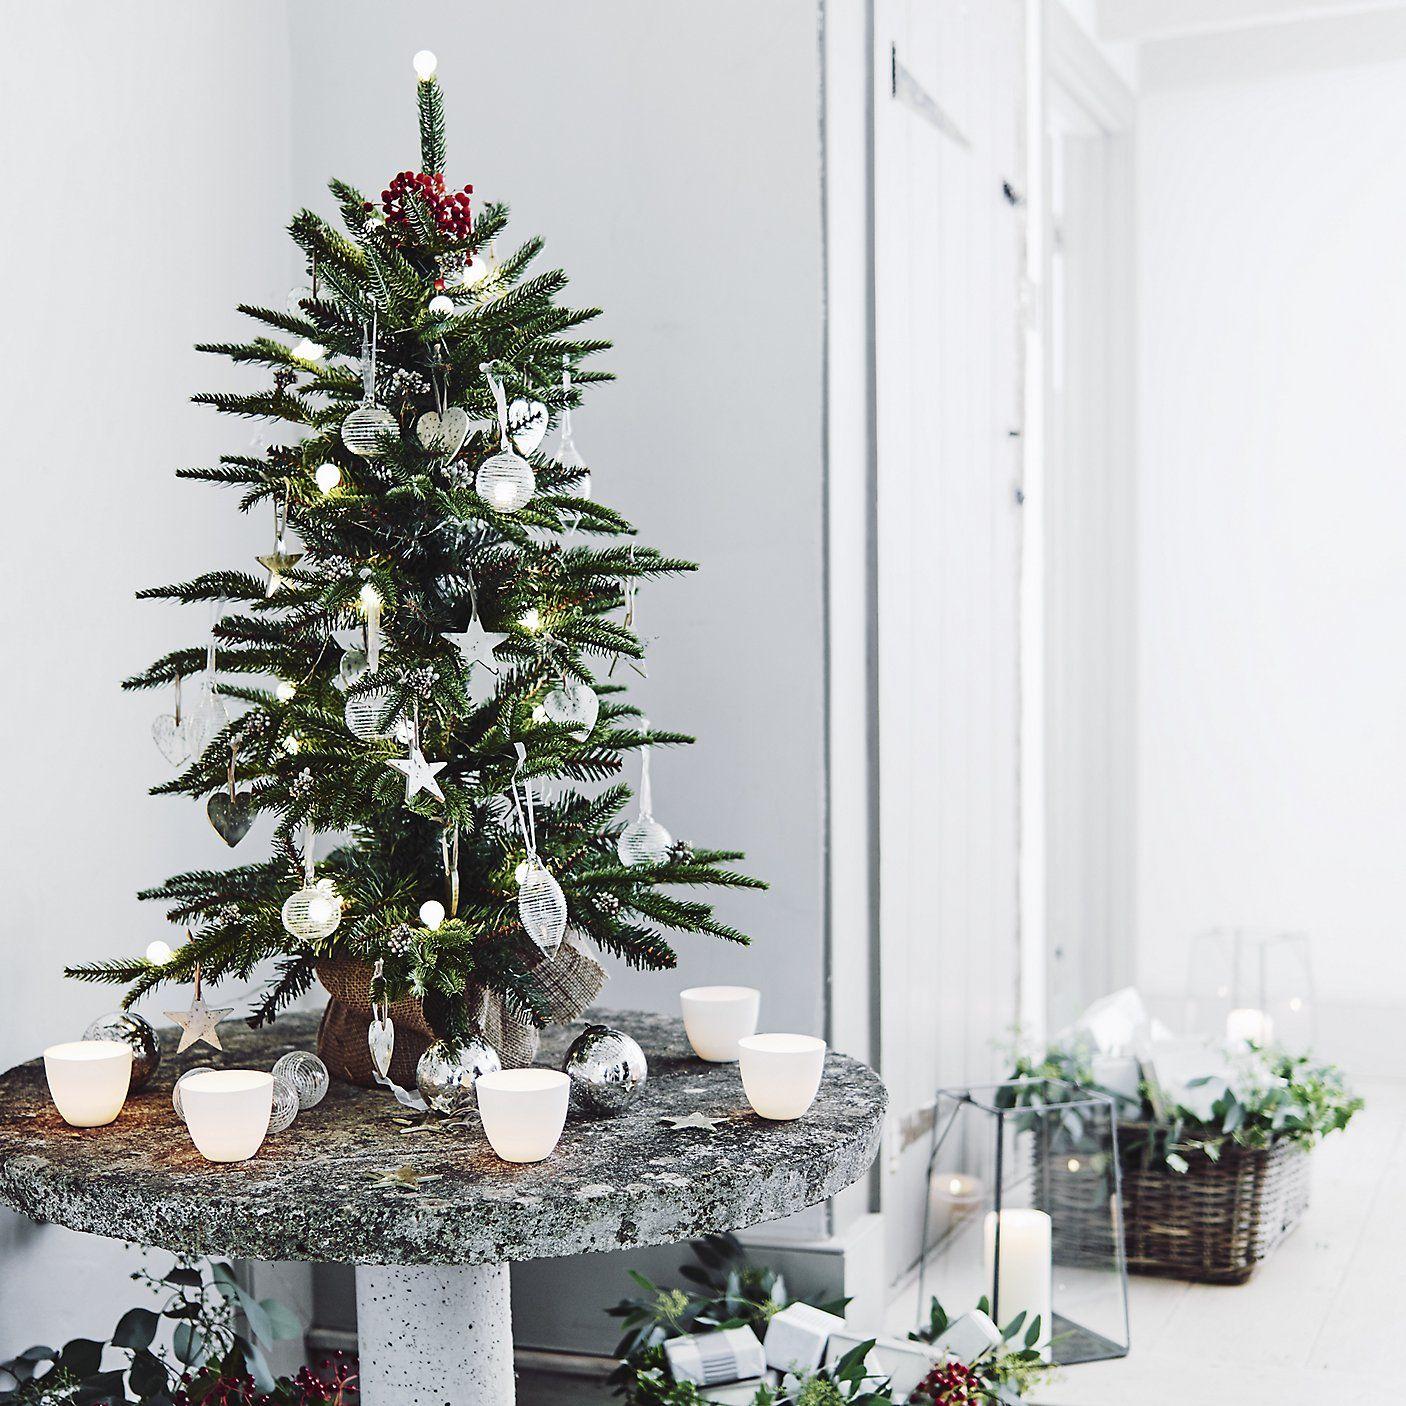 3ft White Christmas Tree.Fir Christmas Tree 3ft The White Company Najkrajsie